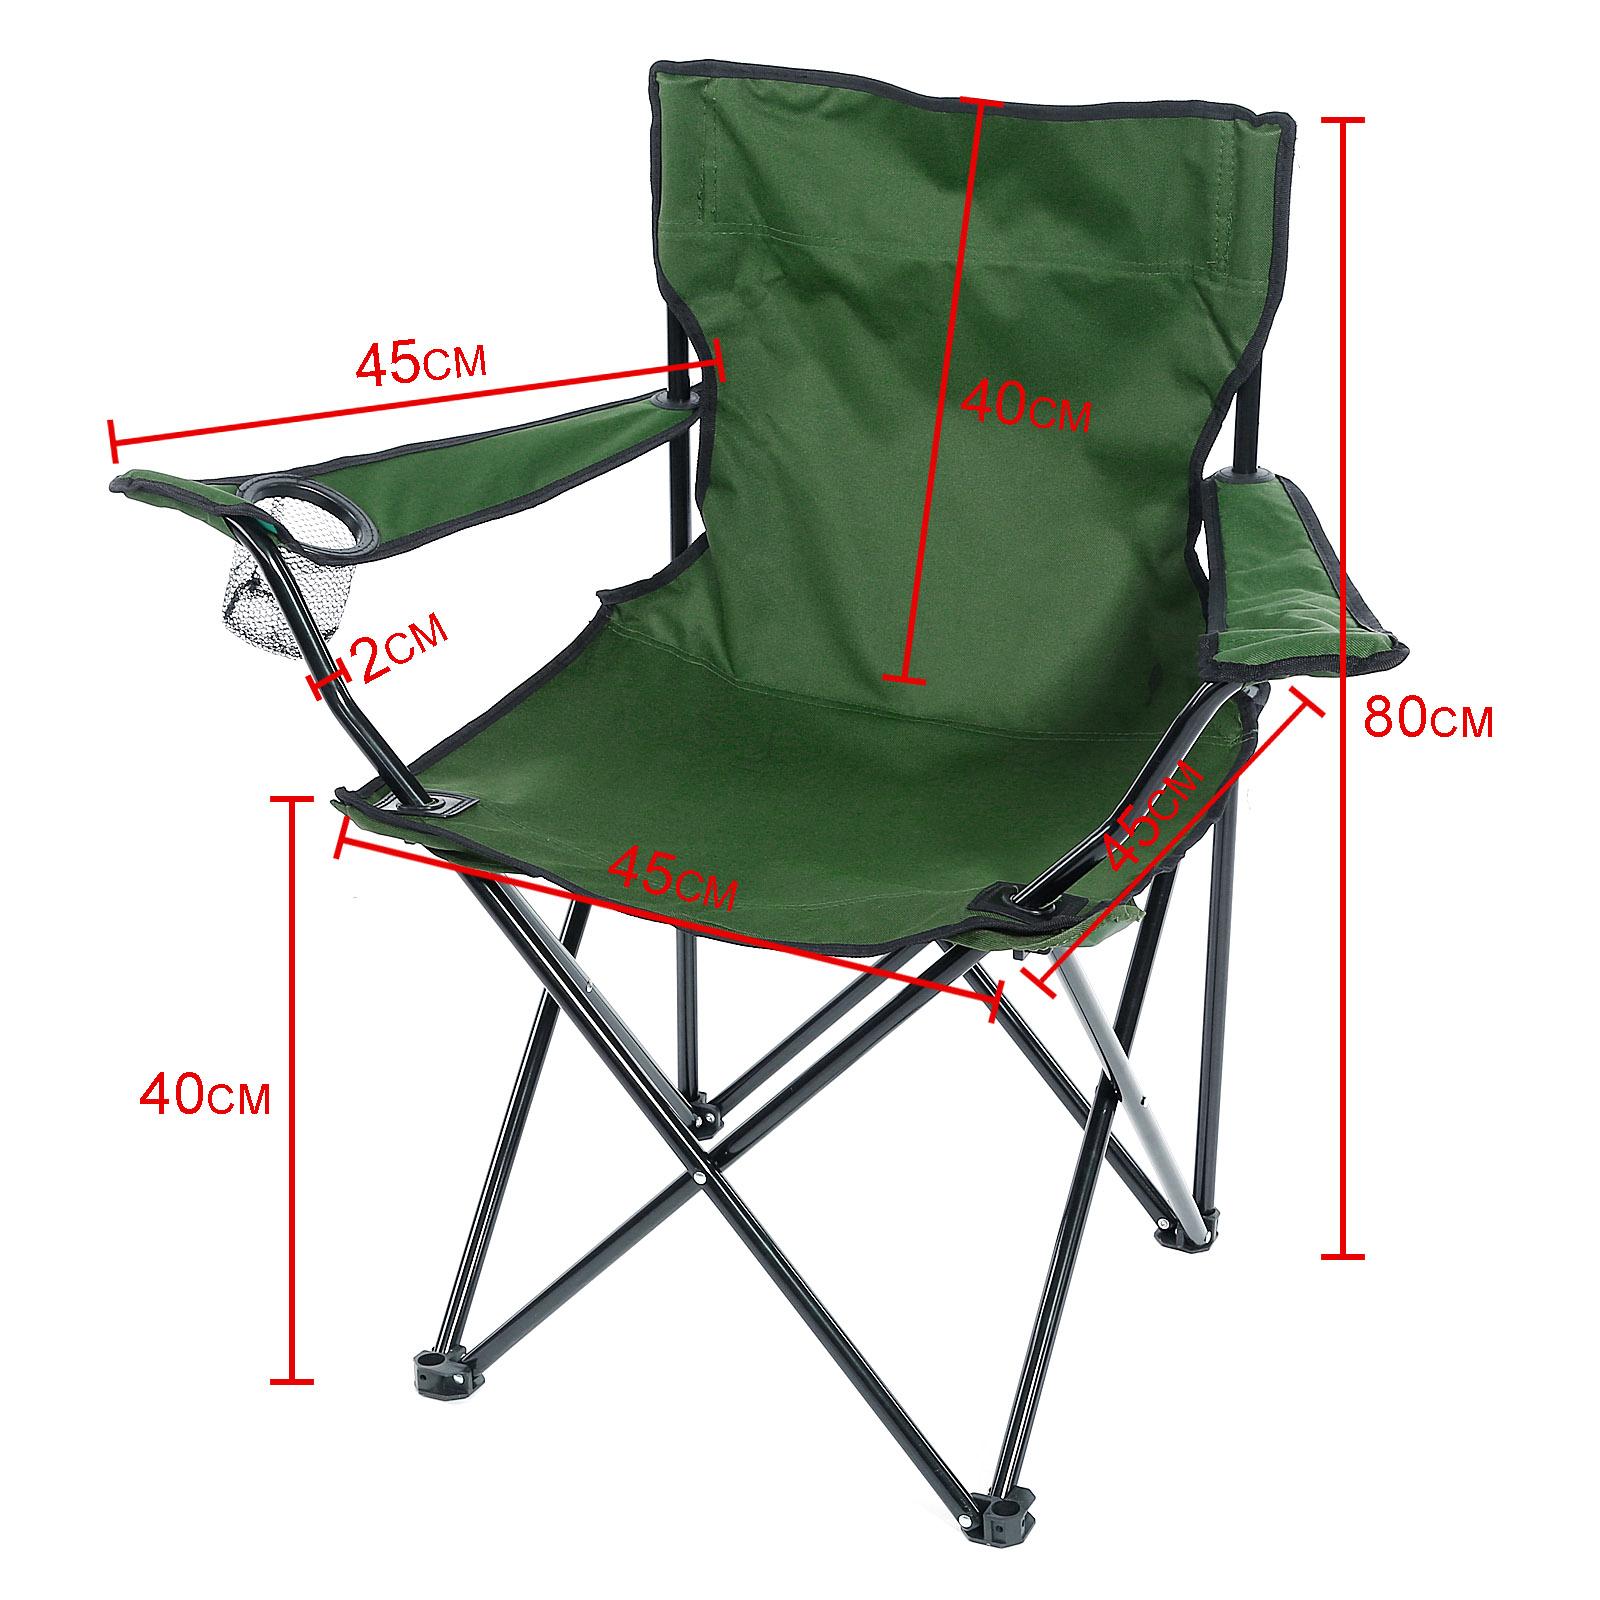 camping chaise pliante en oxford portable activit s ext rieures outdoor ebay. Black Bedroom Furniture Sets. Home Design Ideas